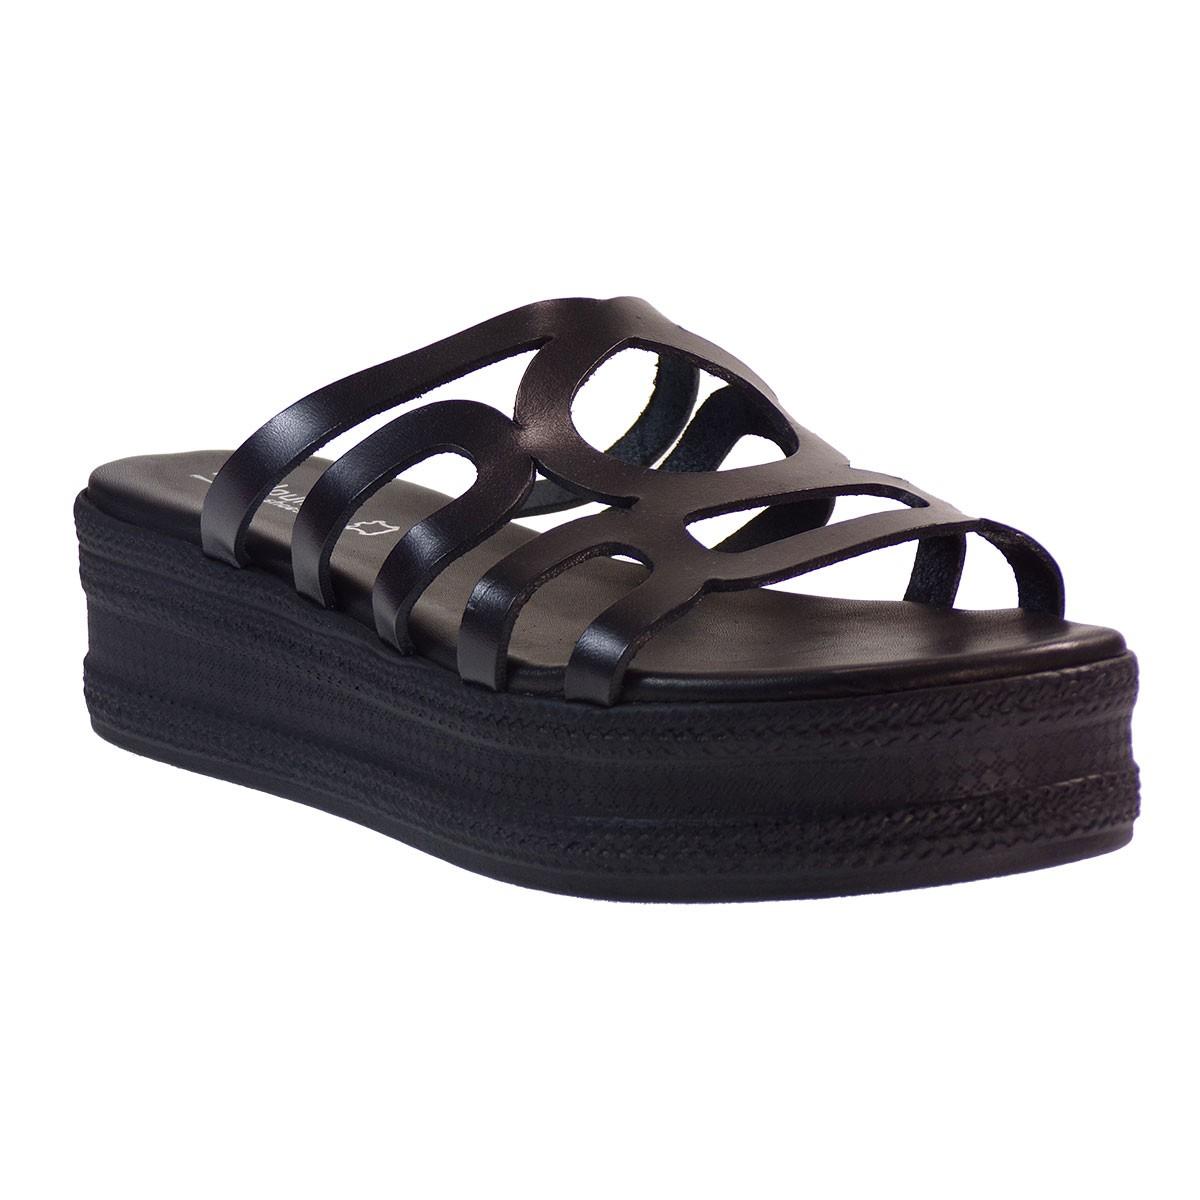 Fardoulis shoes Γυναικείες Πλατφόρμες Παντόφλες 63439 Μαύρο Δέρμα